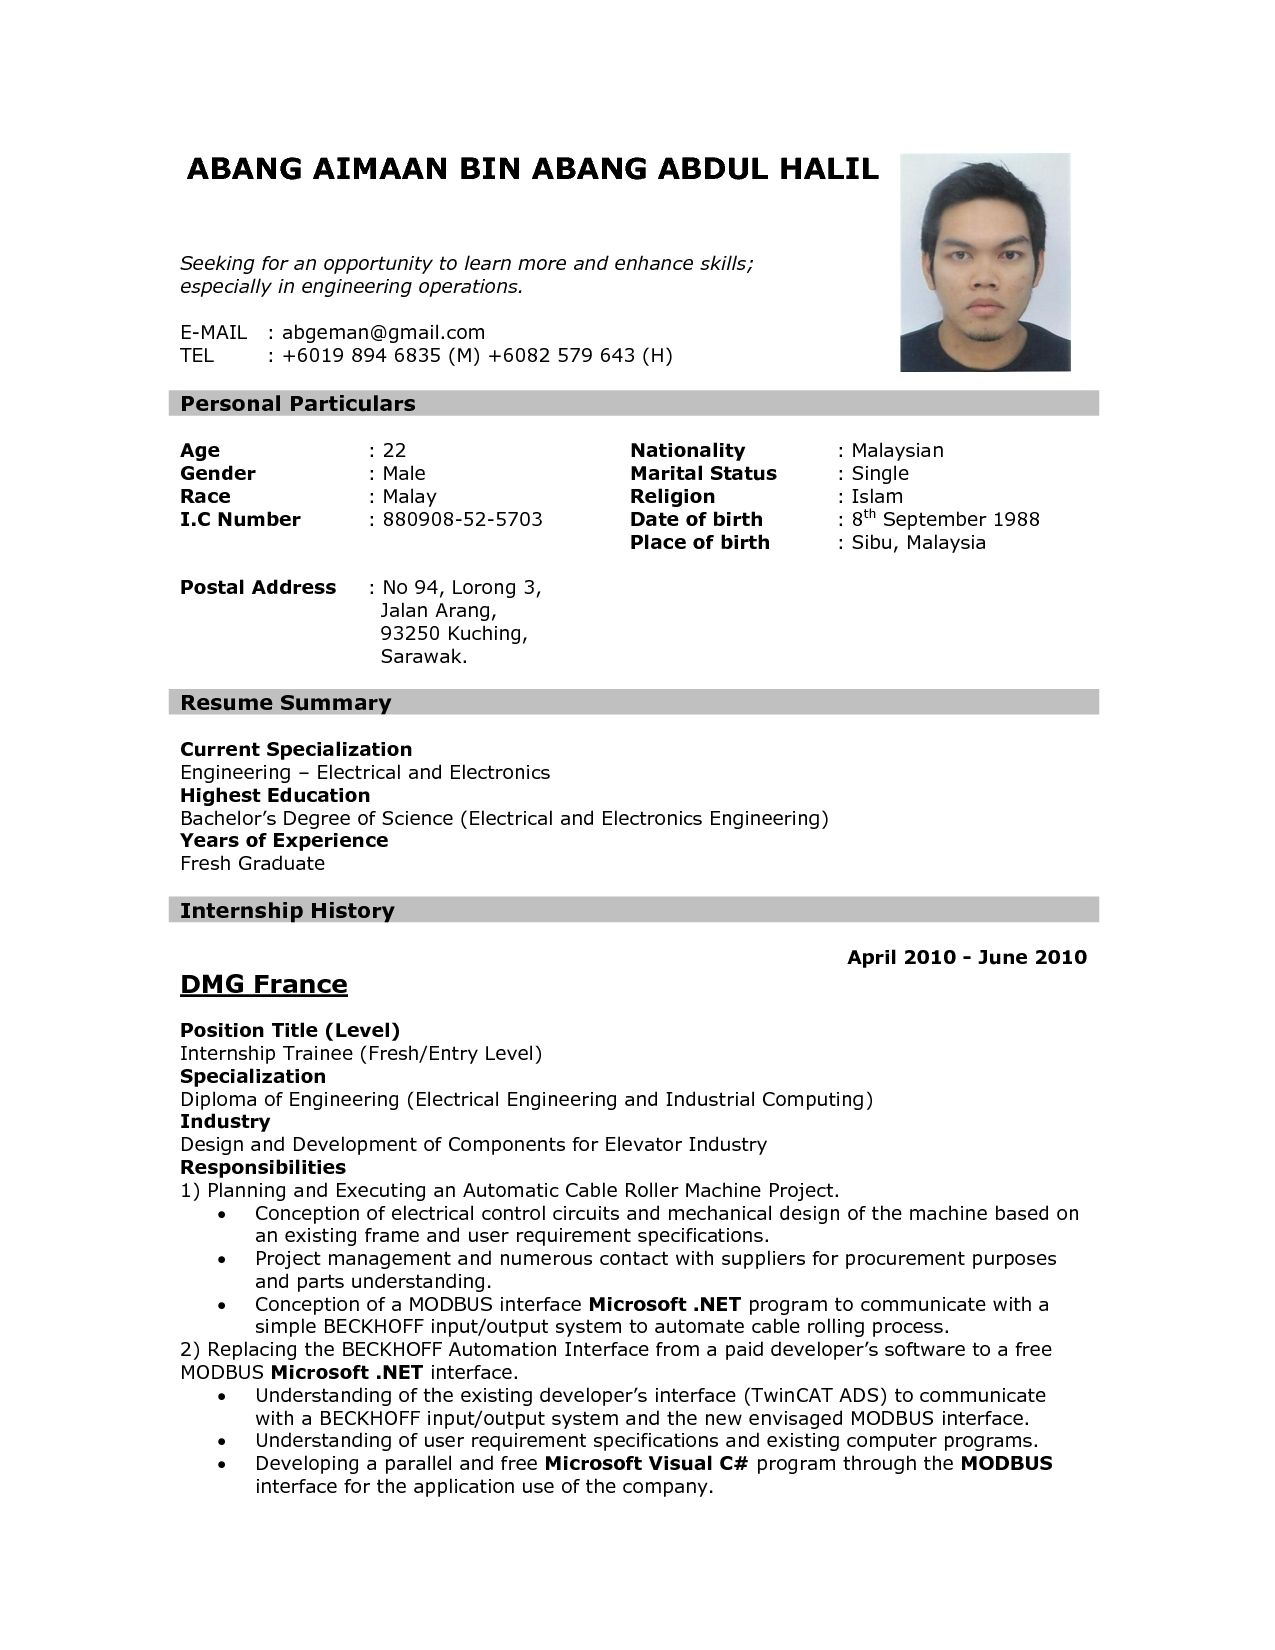 App Resume Format Job Resume Template Job Resume Samples